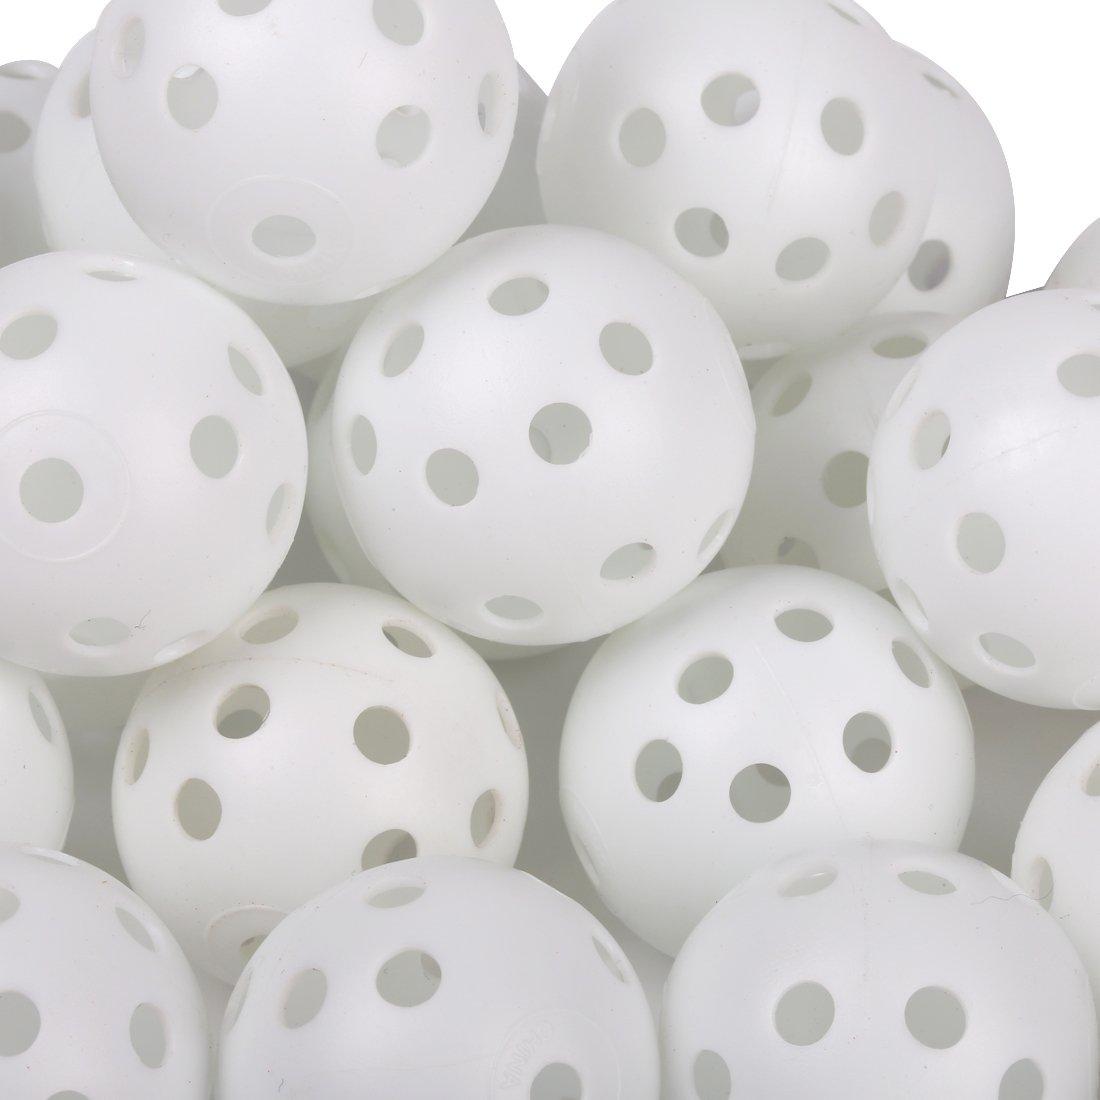 Anduxゴルフ練習プラスチックボール40ホワイトKXQ   B00GZIWGM6